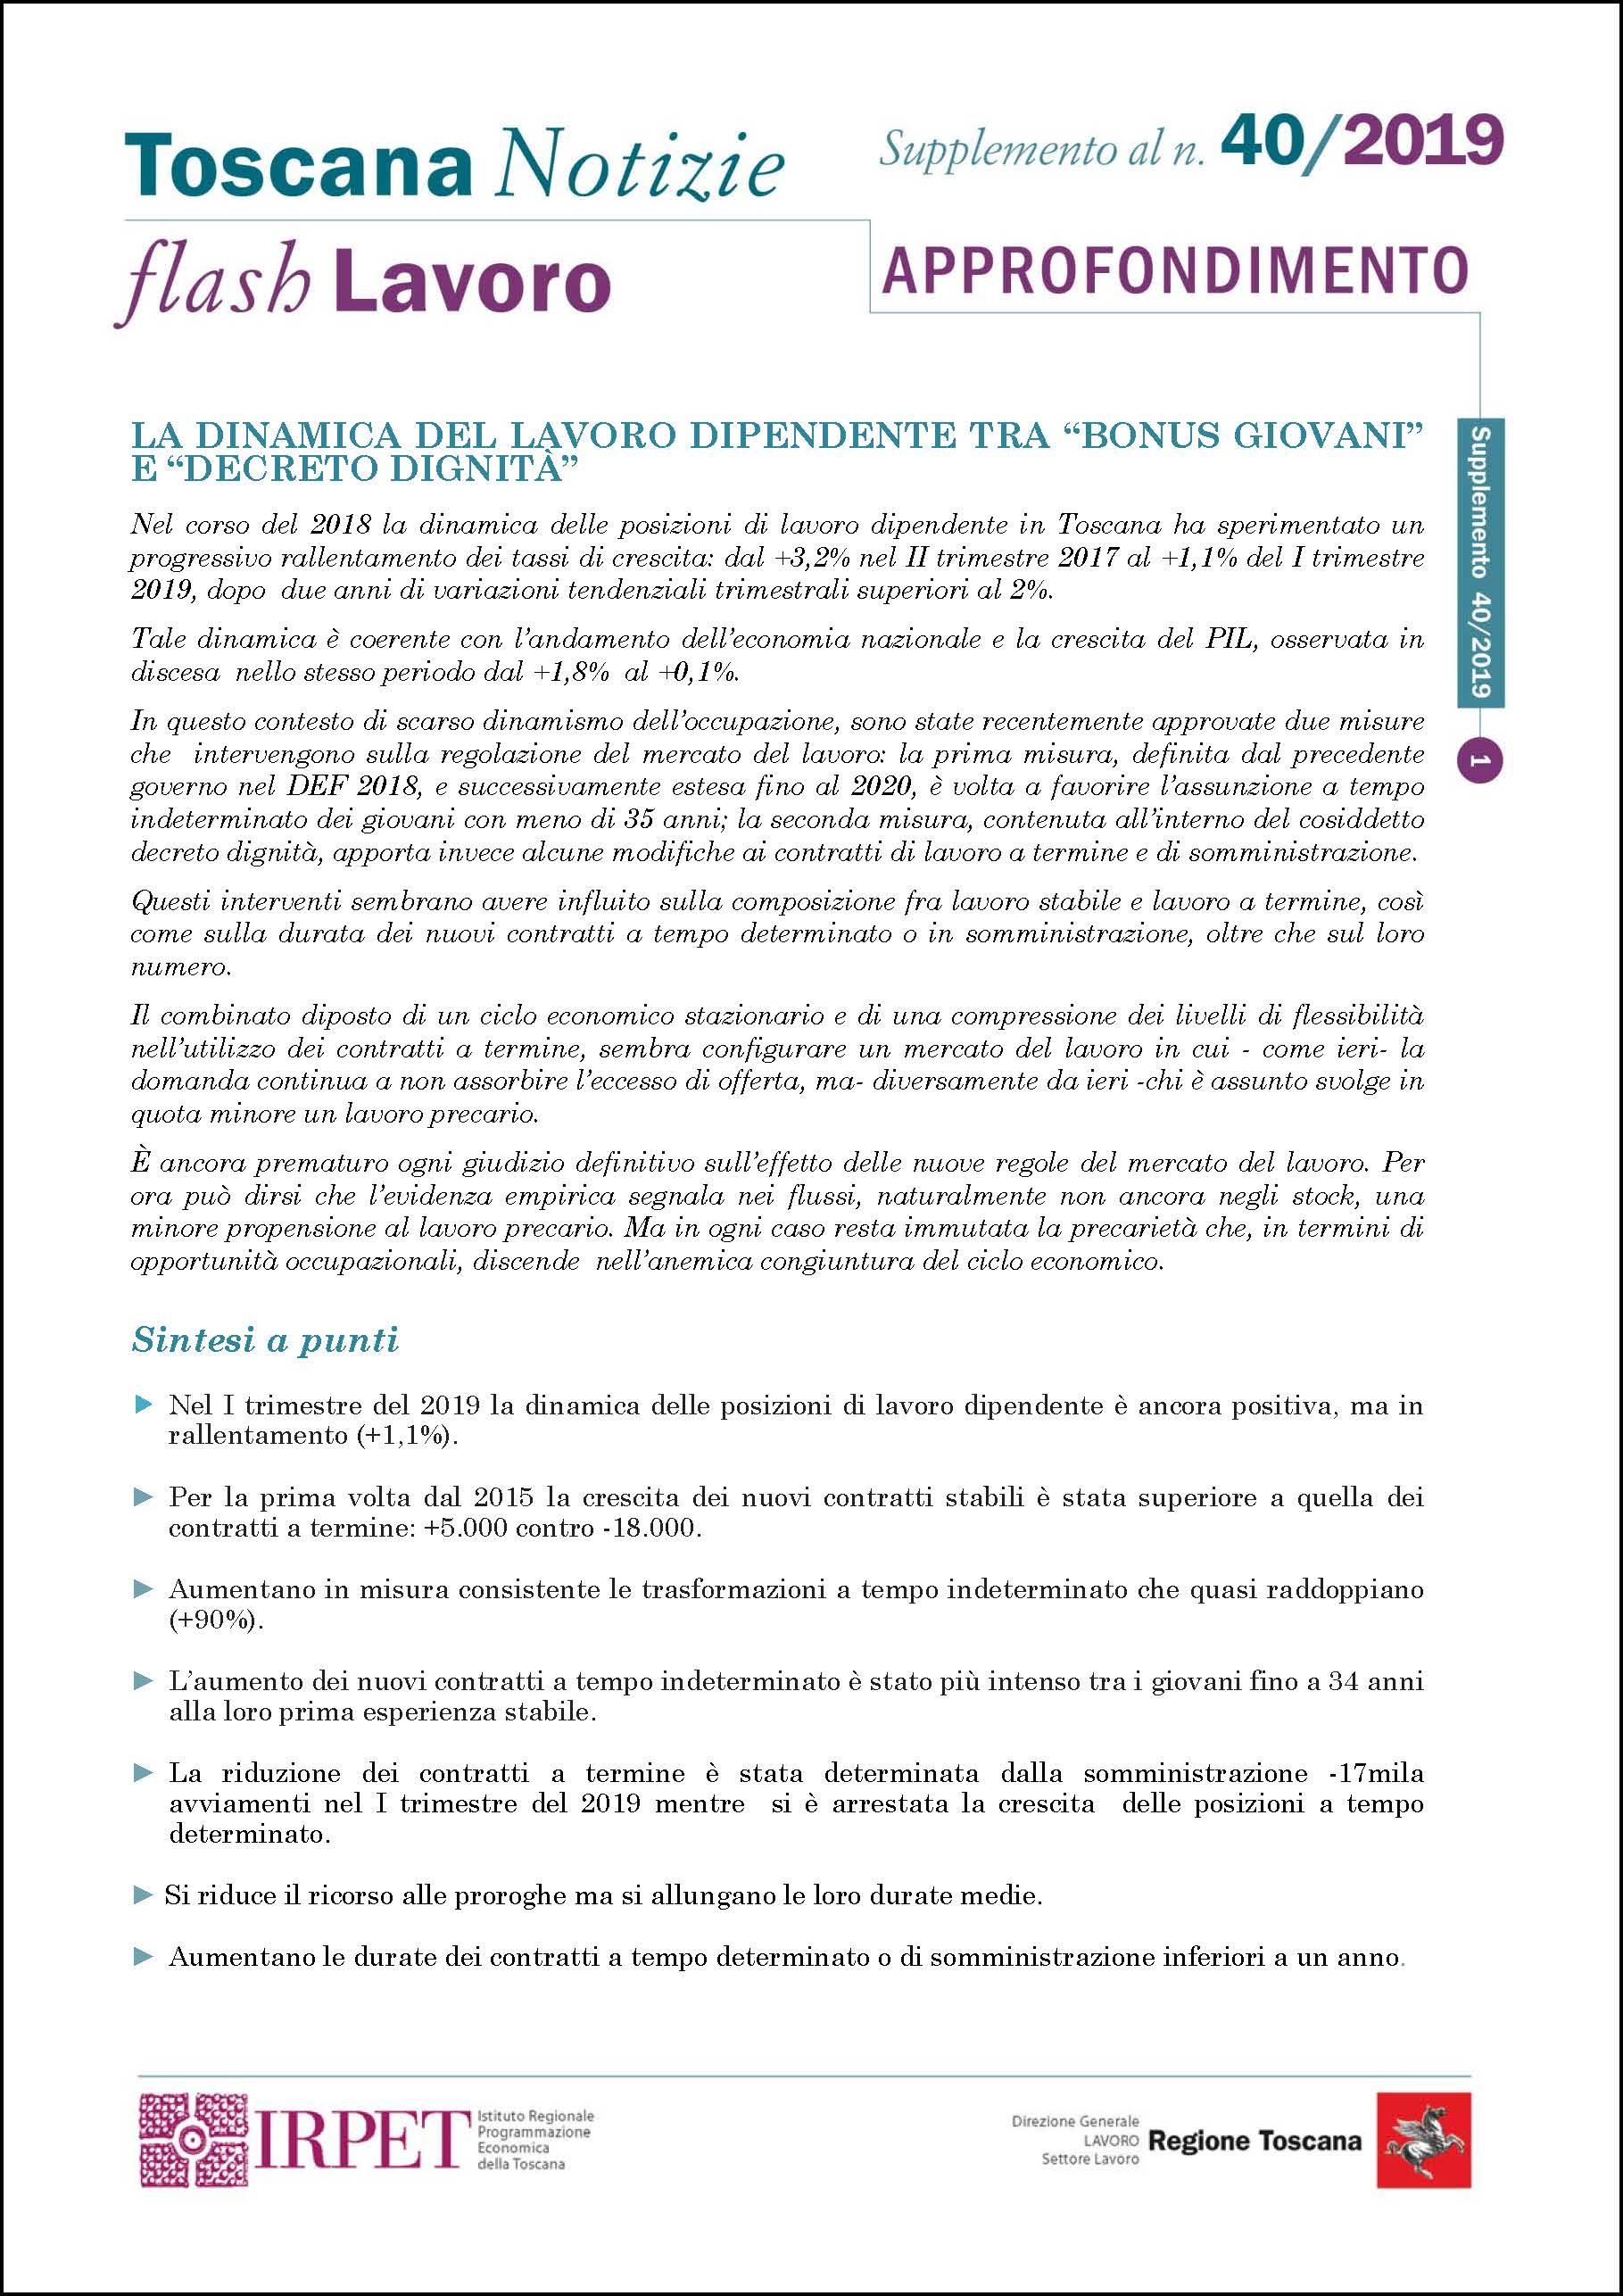 Copertina Supplemento Flash Lavoro 40_19 Approfondimento